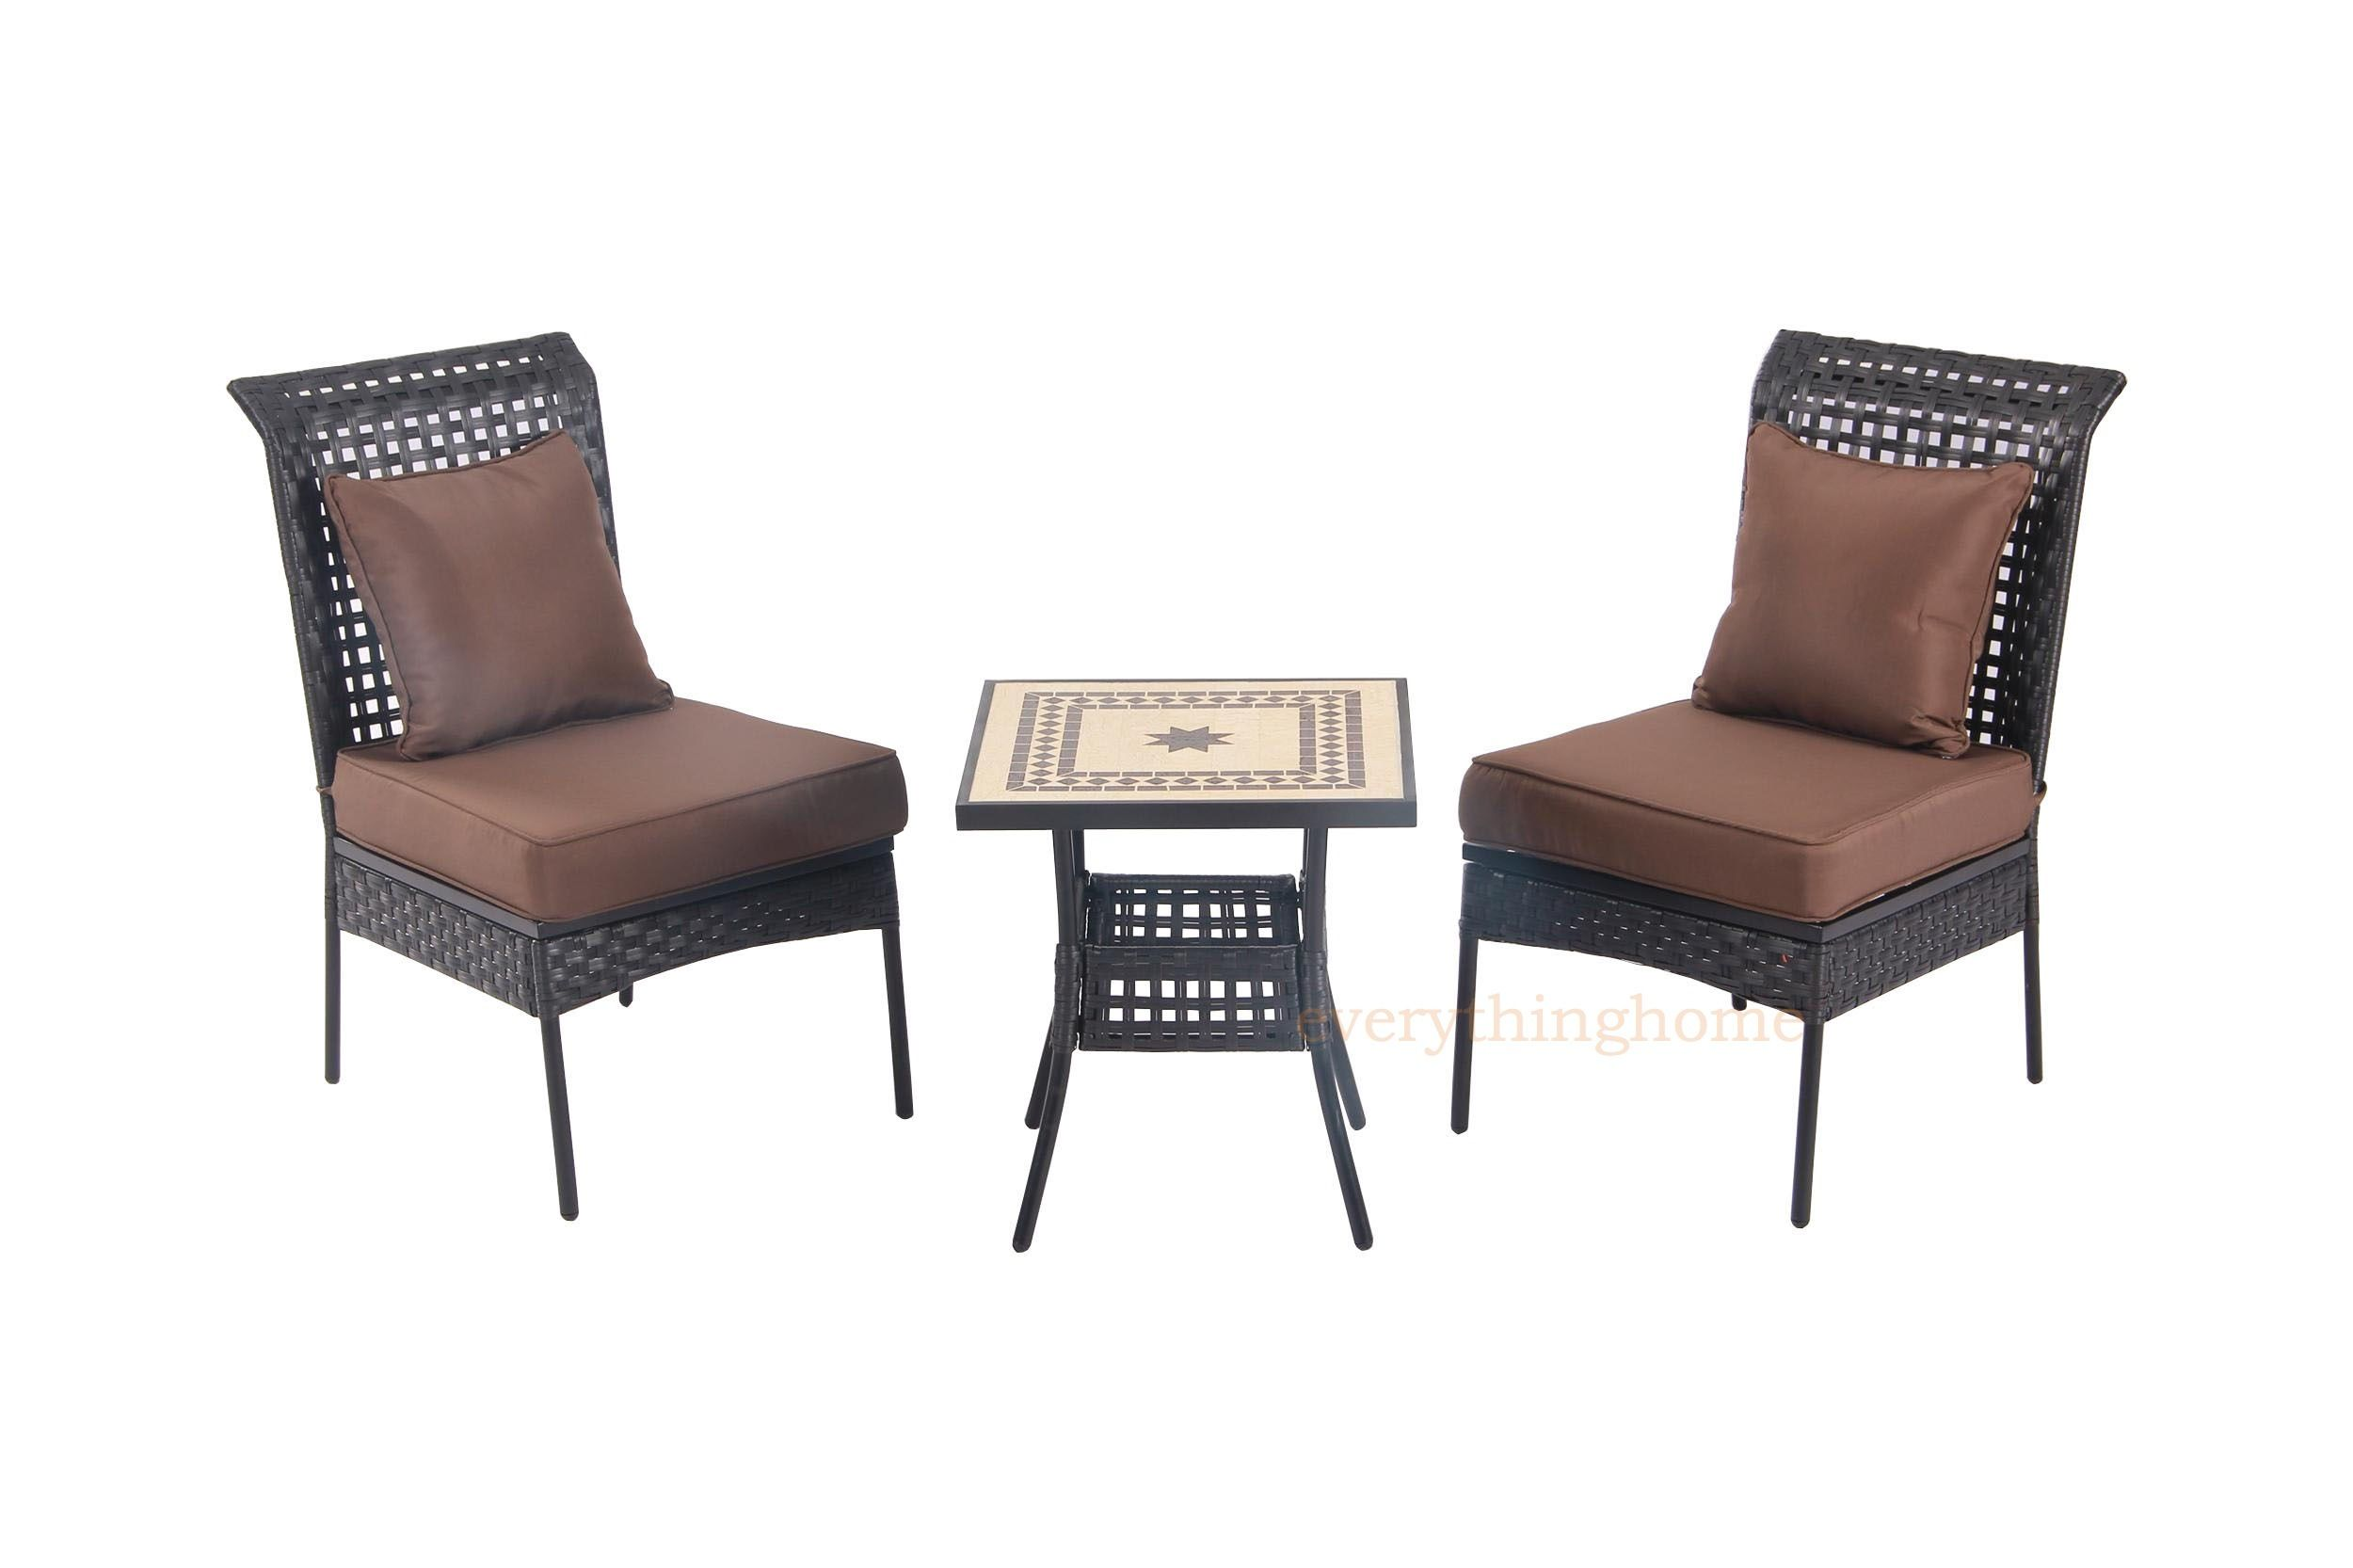 Sonoran all weather wicker piece patio bistro set table outdoor